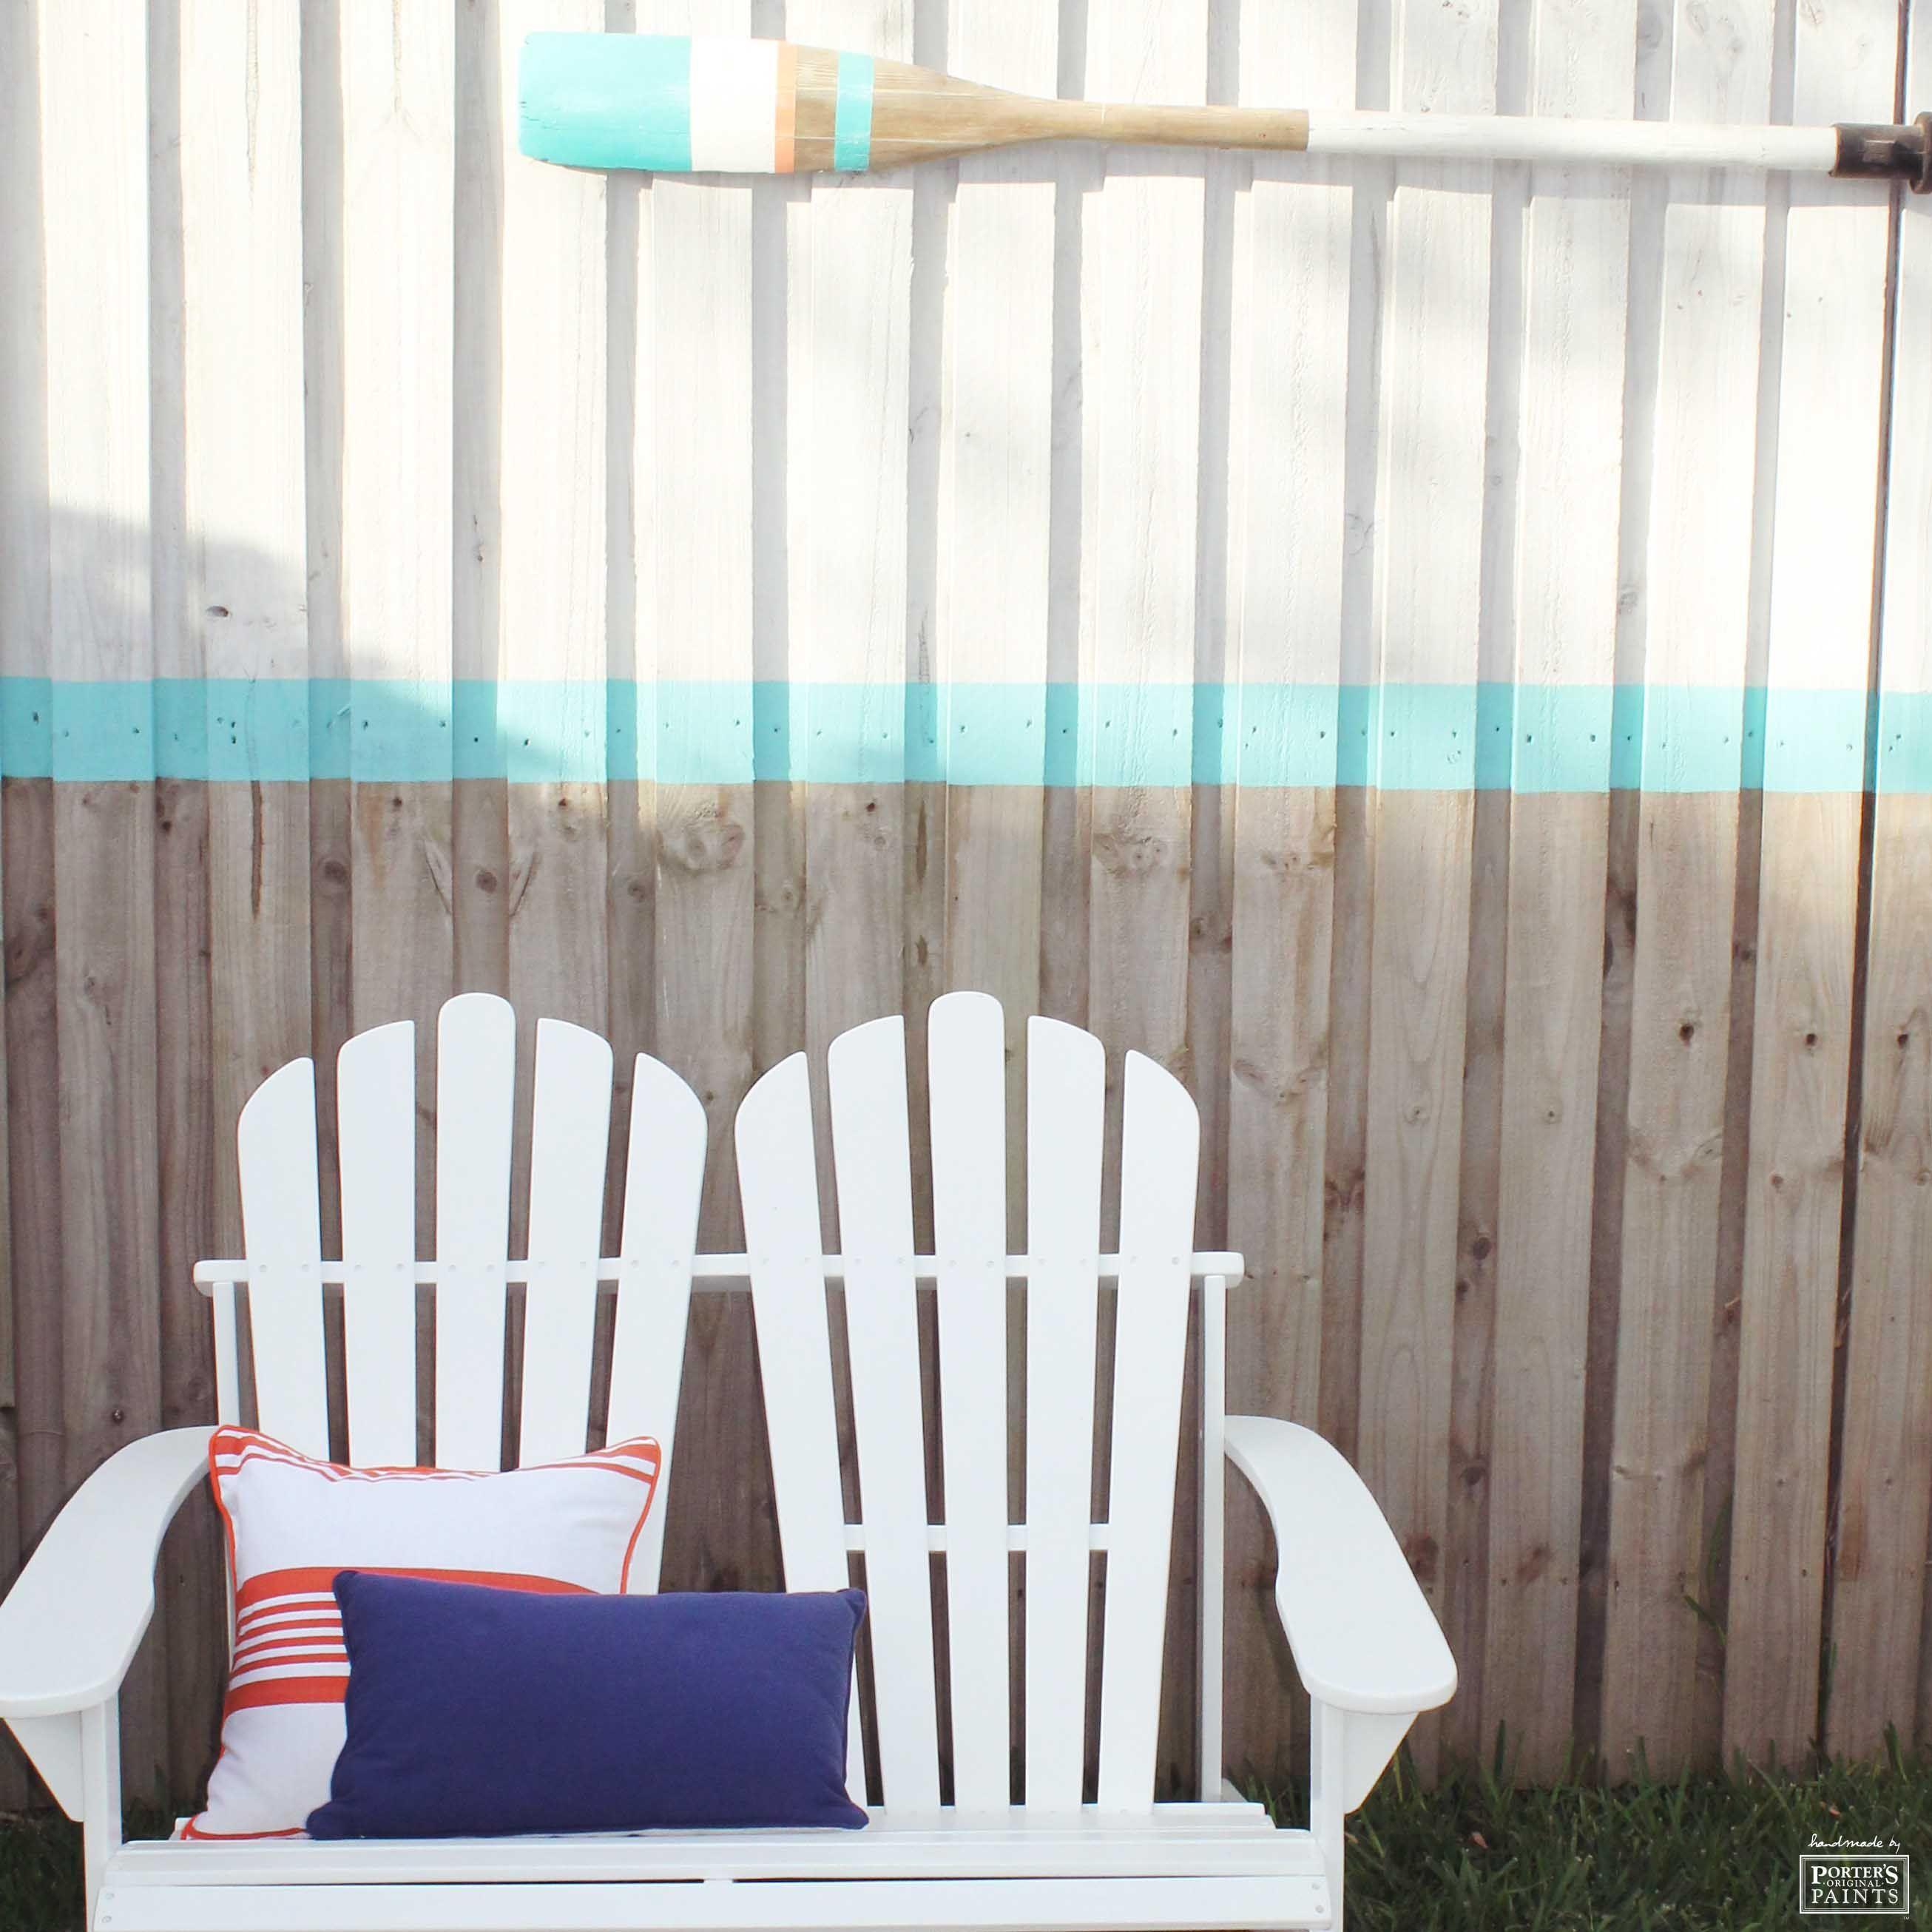 Porter S Paints Palm Beach White And Bora Aqua Satin Enamel Evoking Seaside Serenity